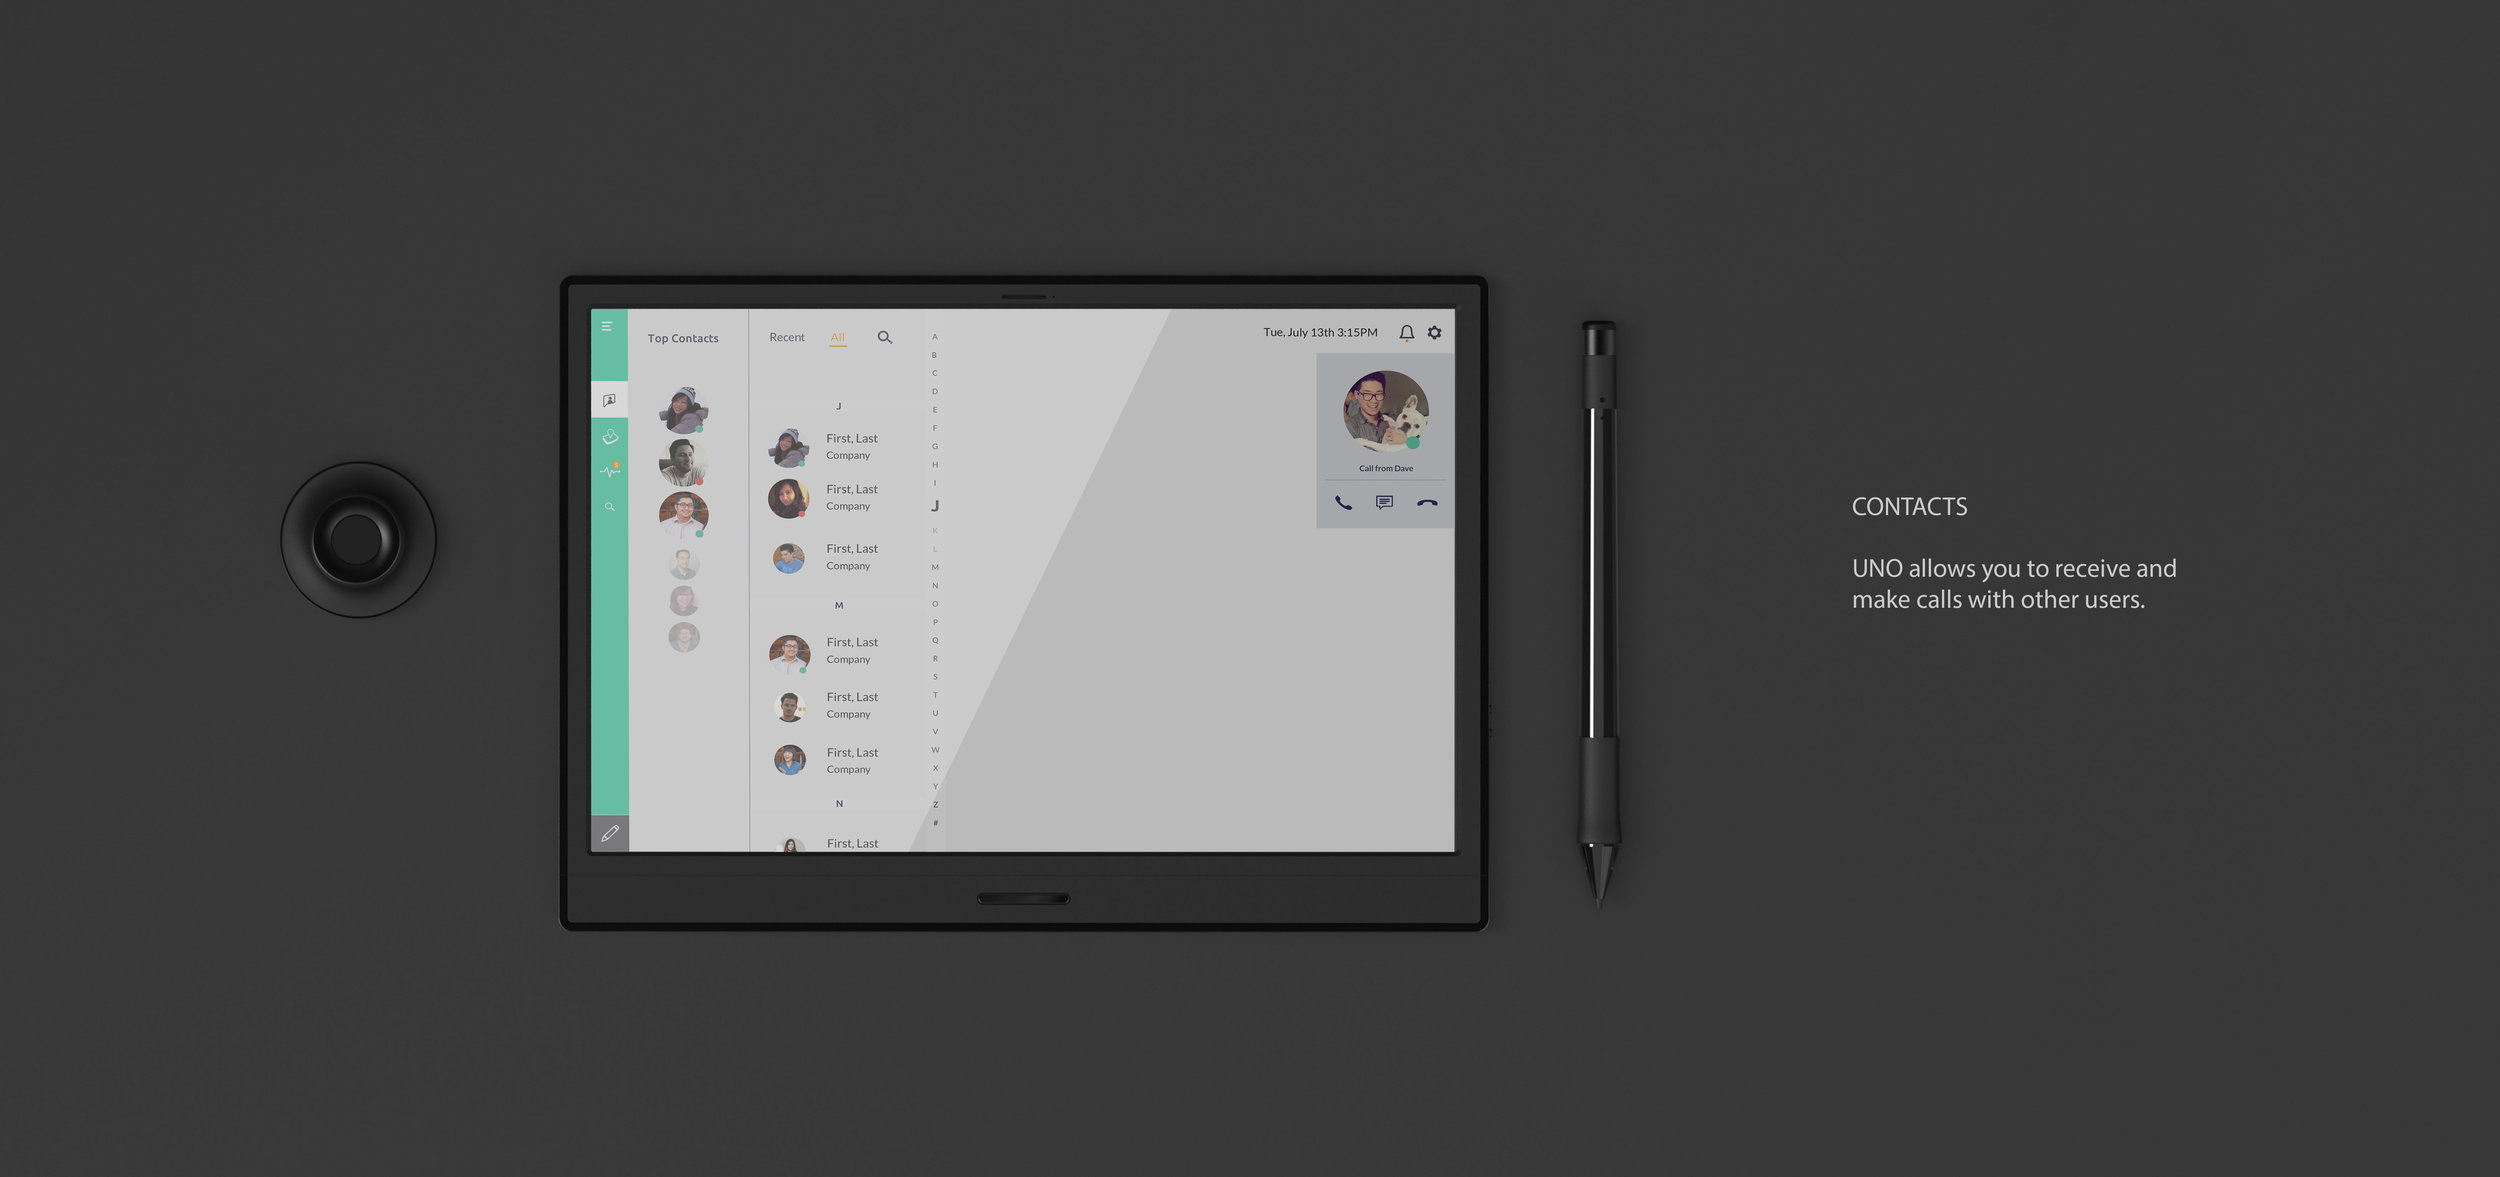 SIDE_UNO_interface-06.jpg